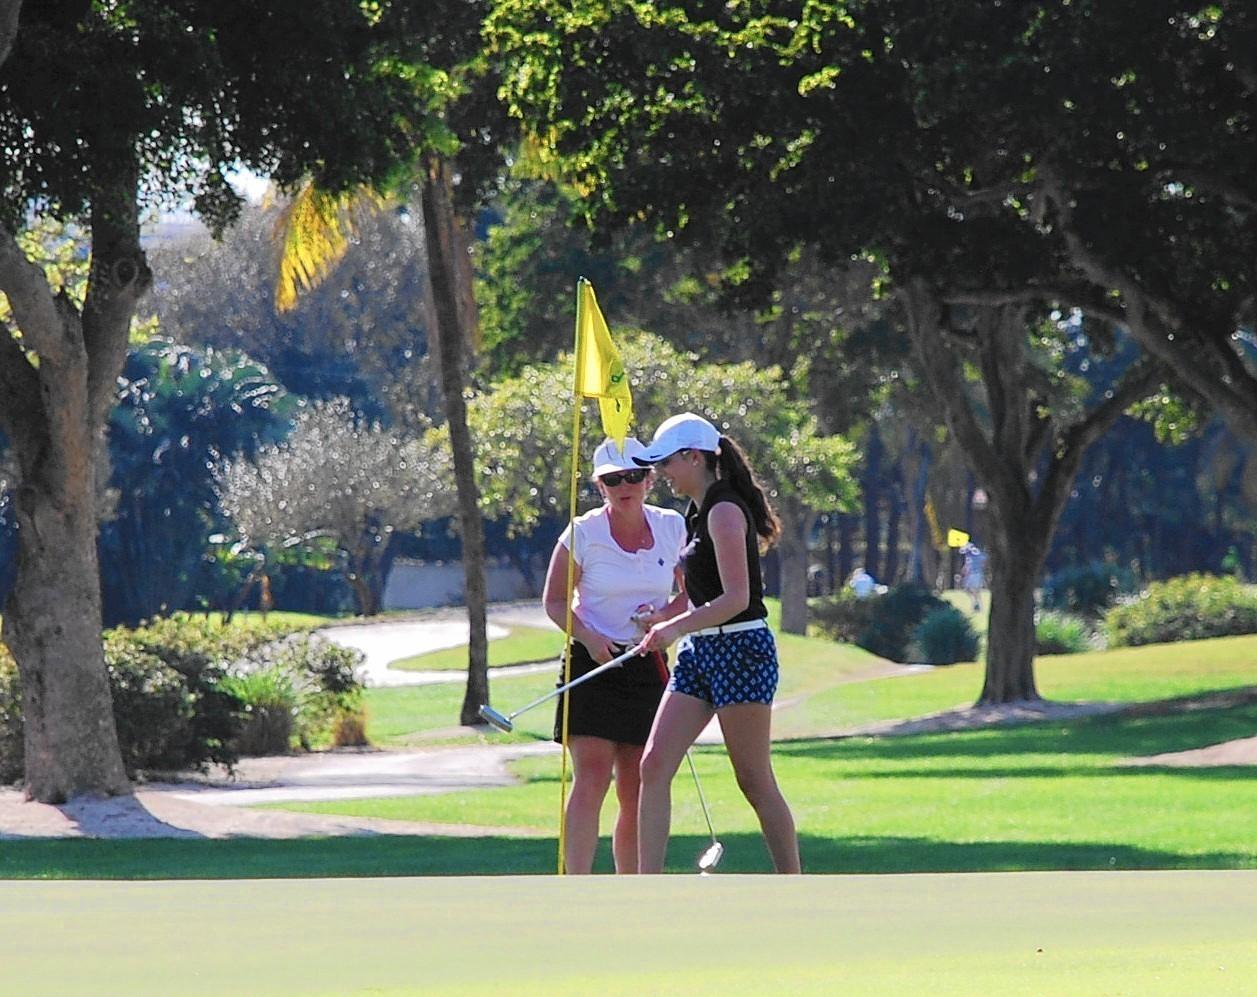 Was mistake Florida amateur golf events useful